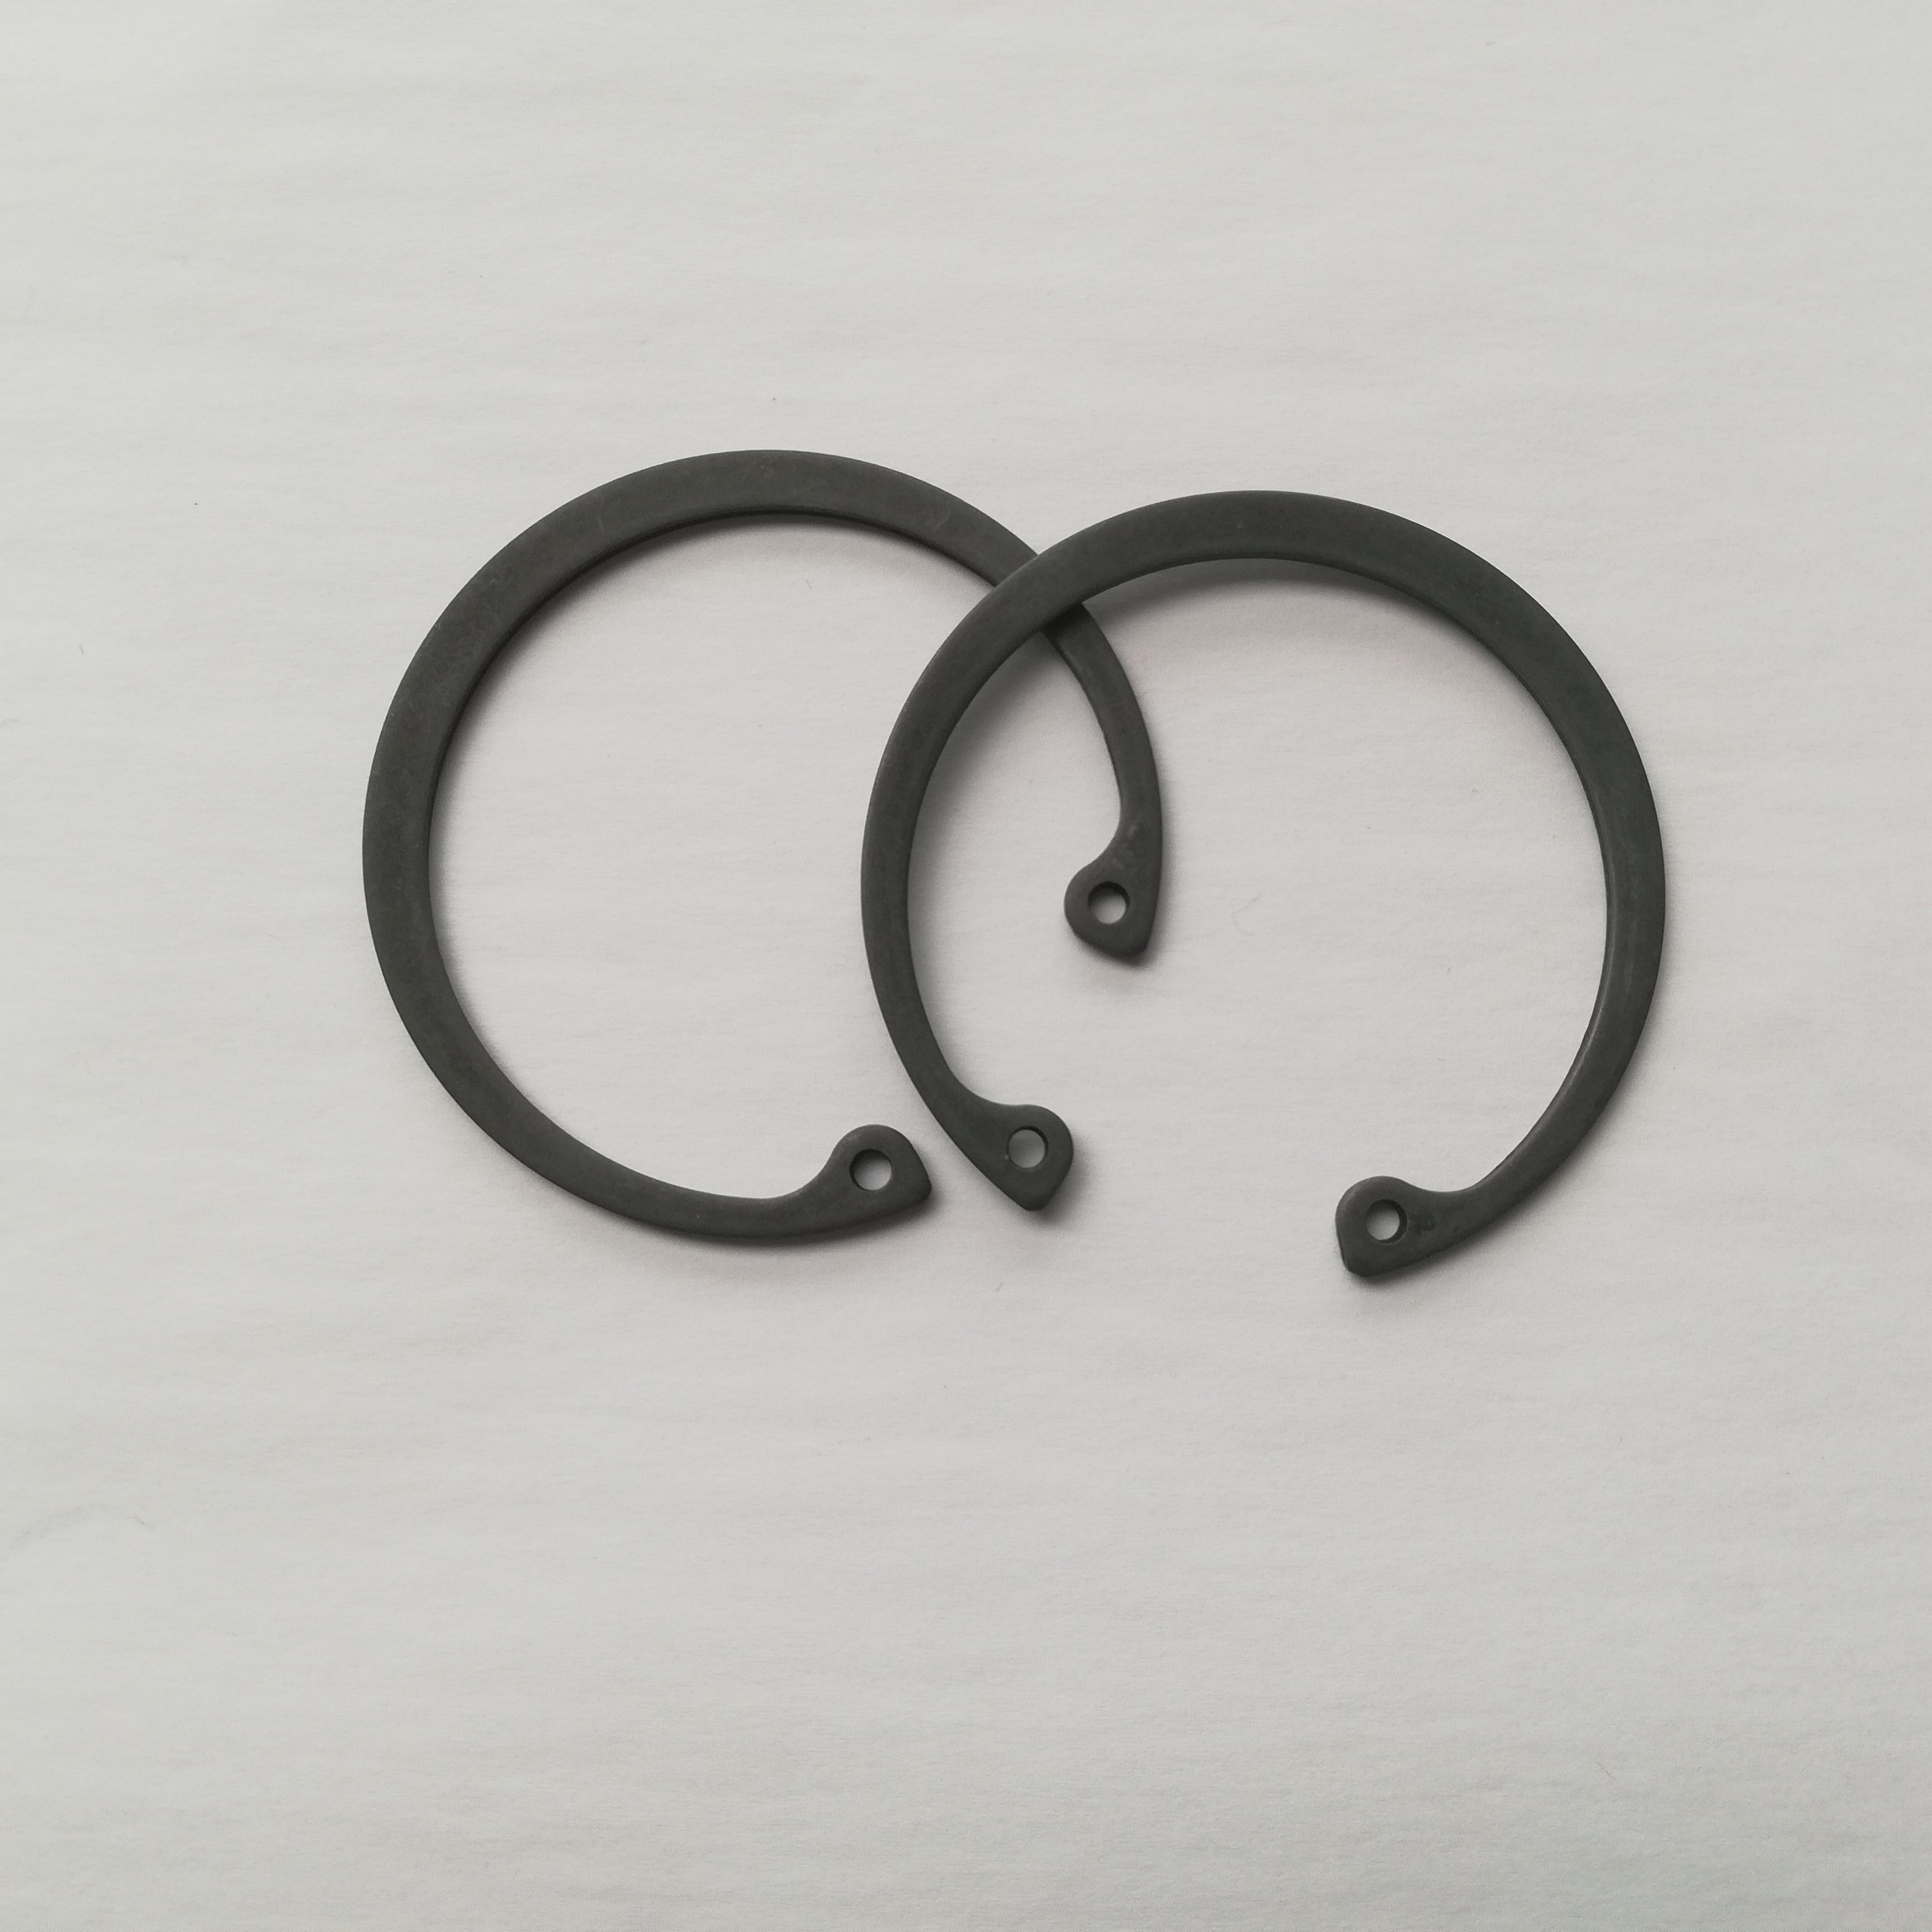 M40 Internal Snap Rings Spring Steel Metric DIN 7993B 100 pcs